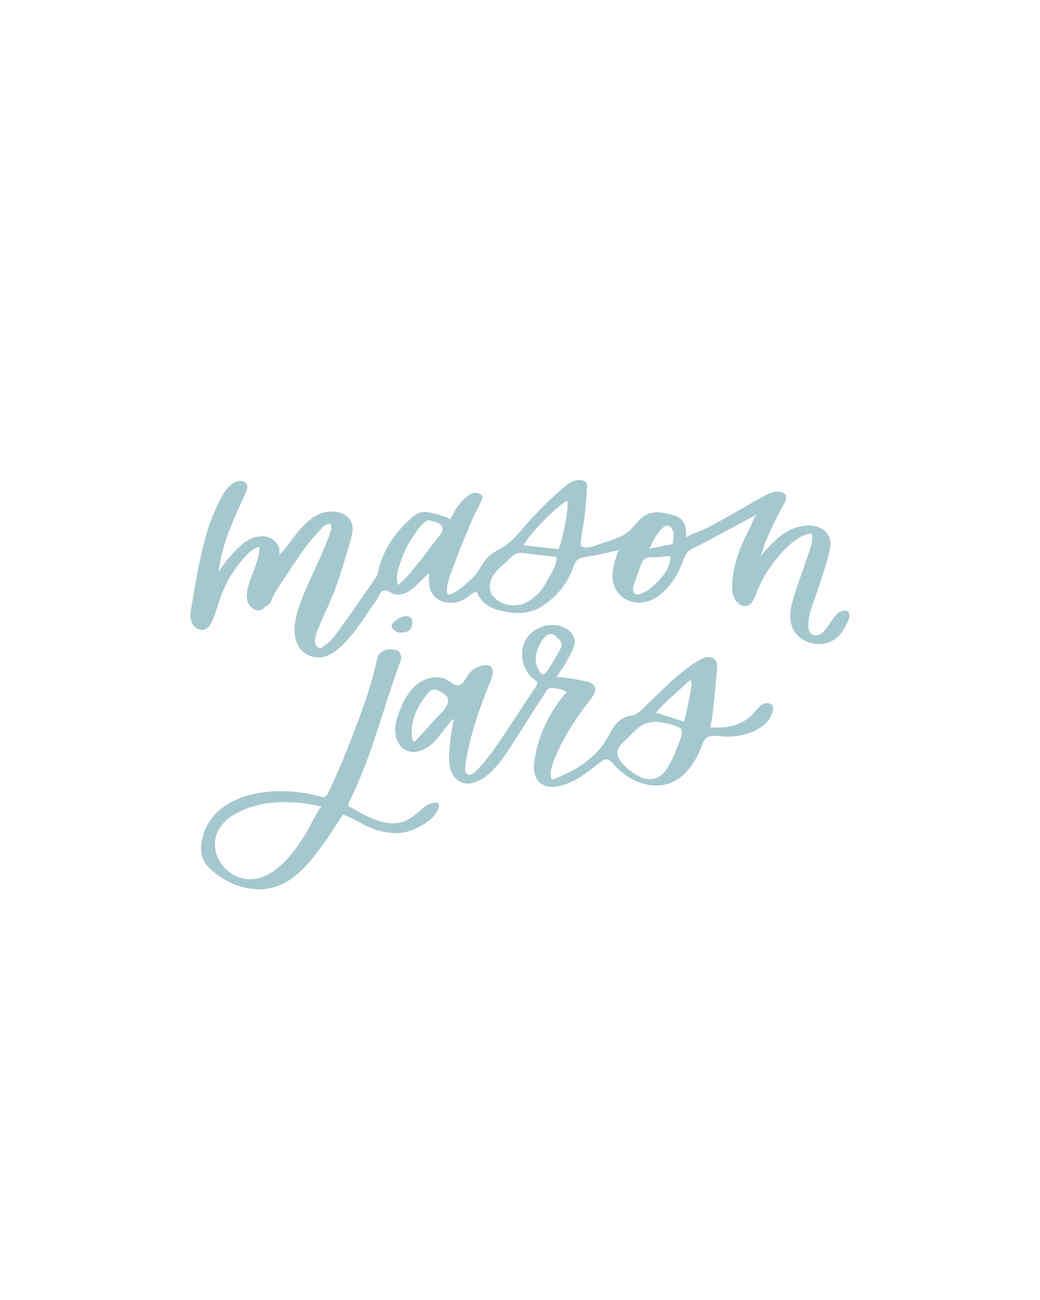 """mason jars"" calligraphy"